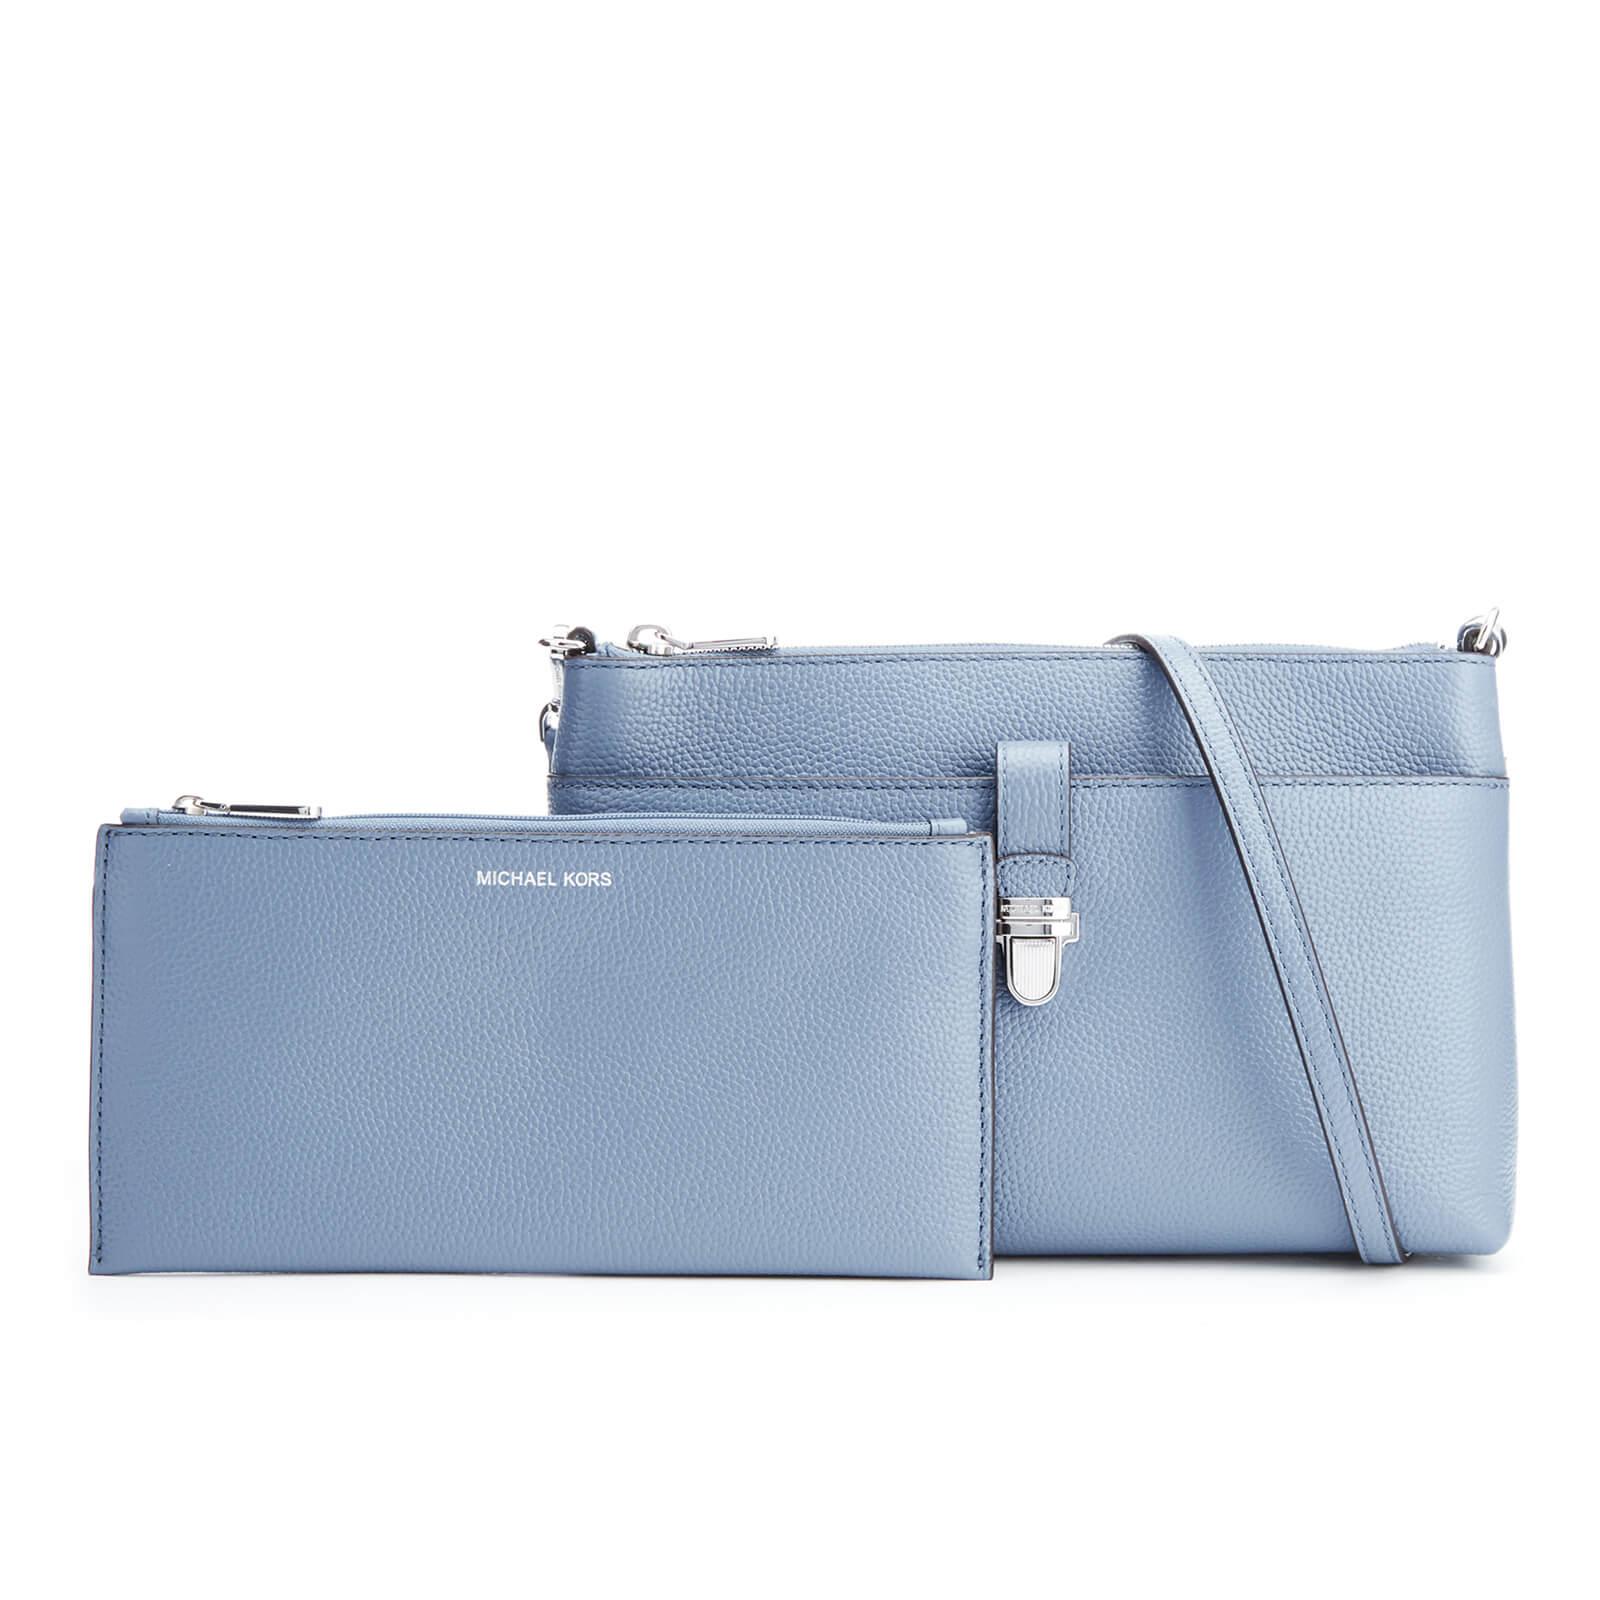 e66c4eaaa00340 MICHAEL MICHAEL KORS Women's Mercer Large Snap Pocket Cross Body Bag -  Denim - Free UK Delivery over £50